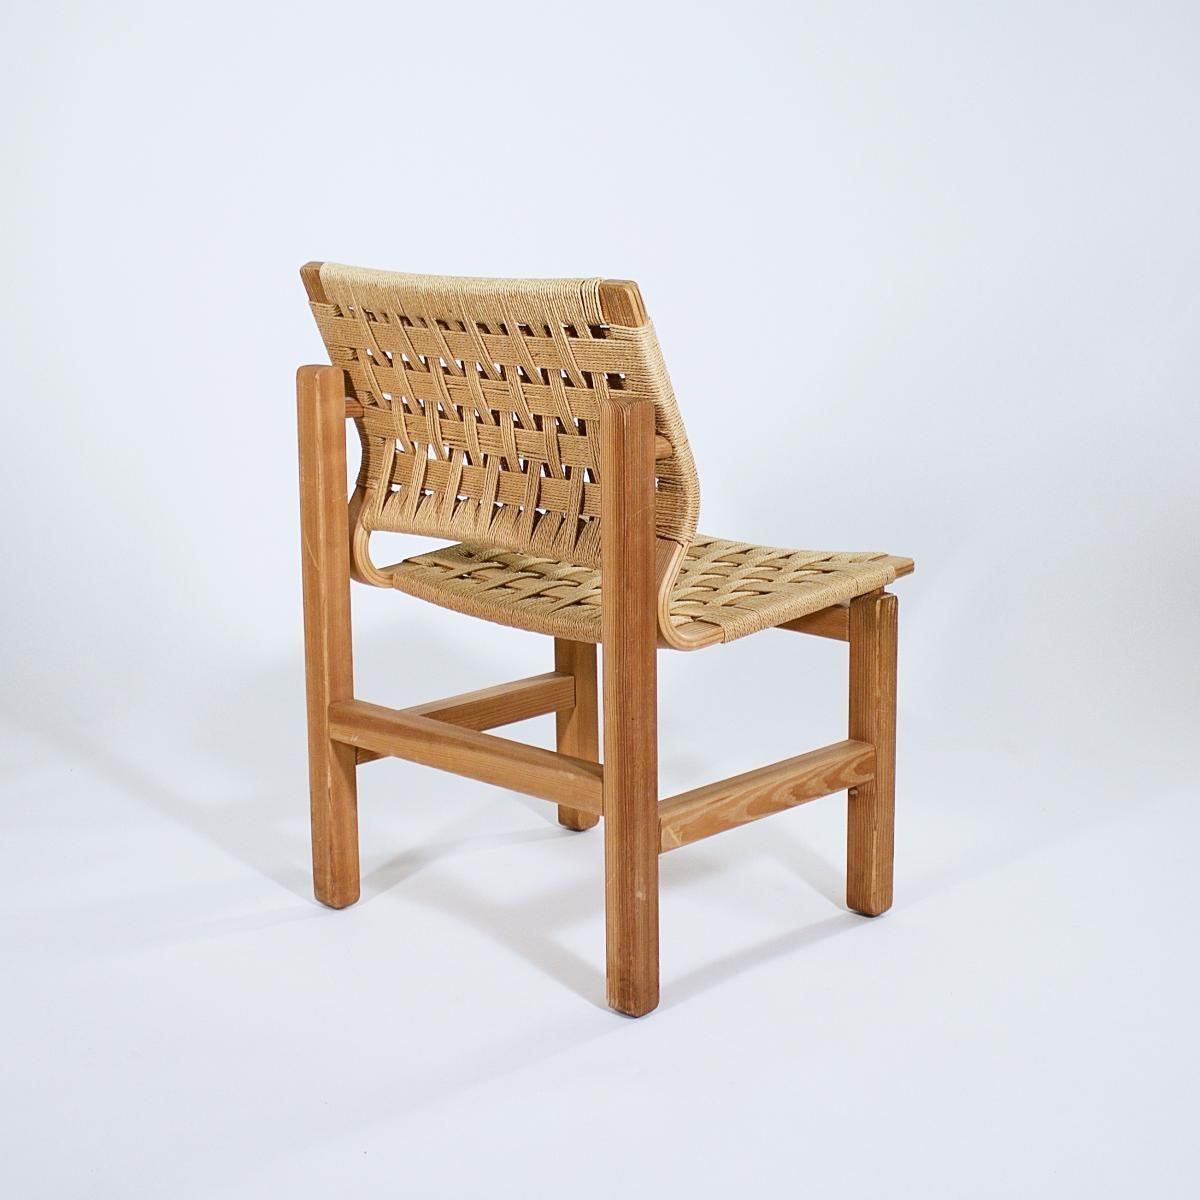 Pine Woven Furniture